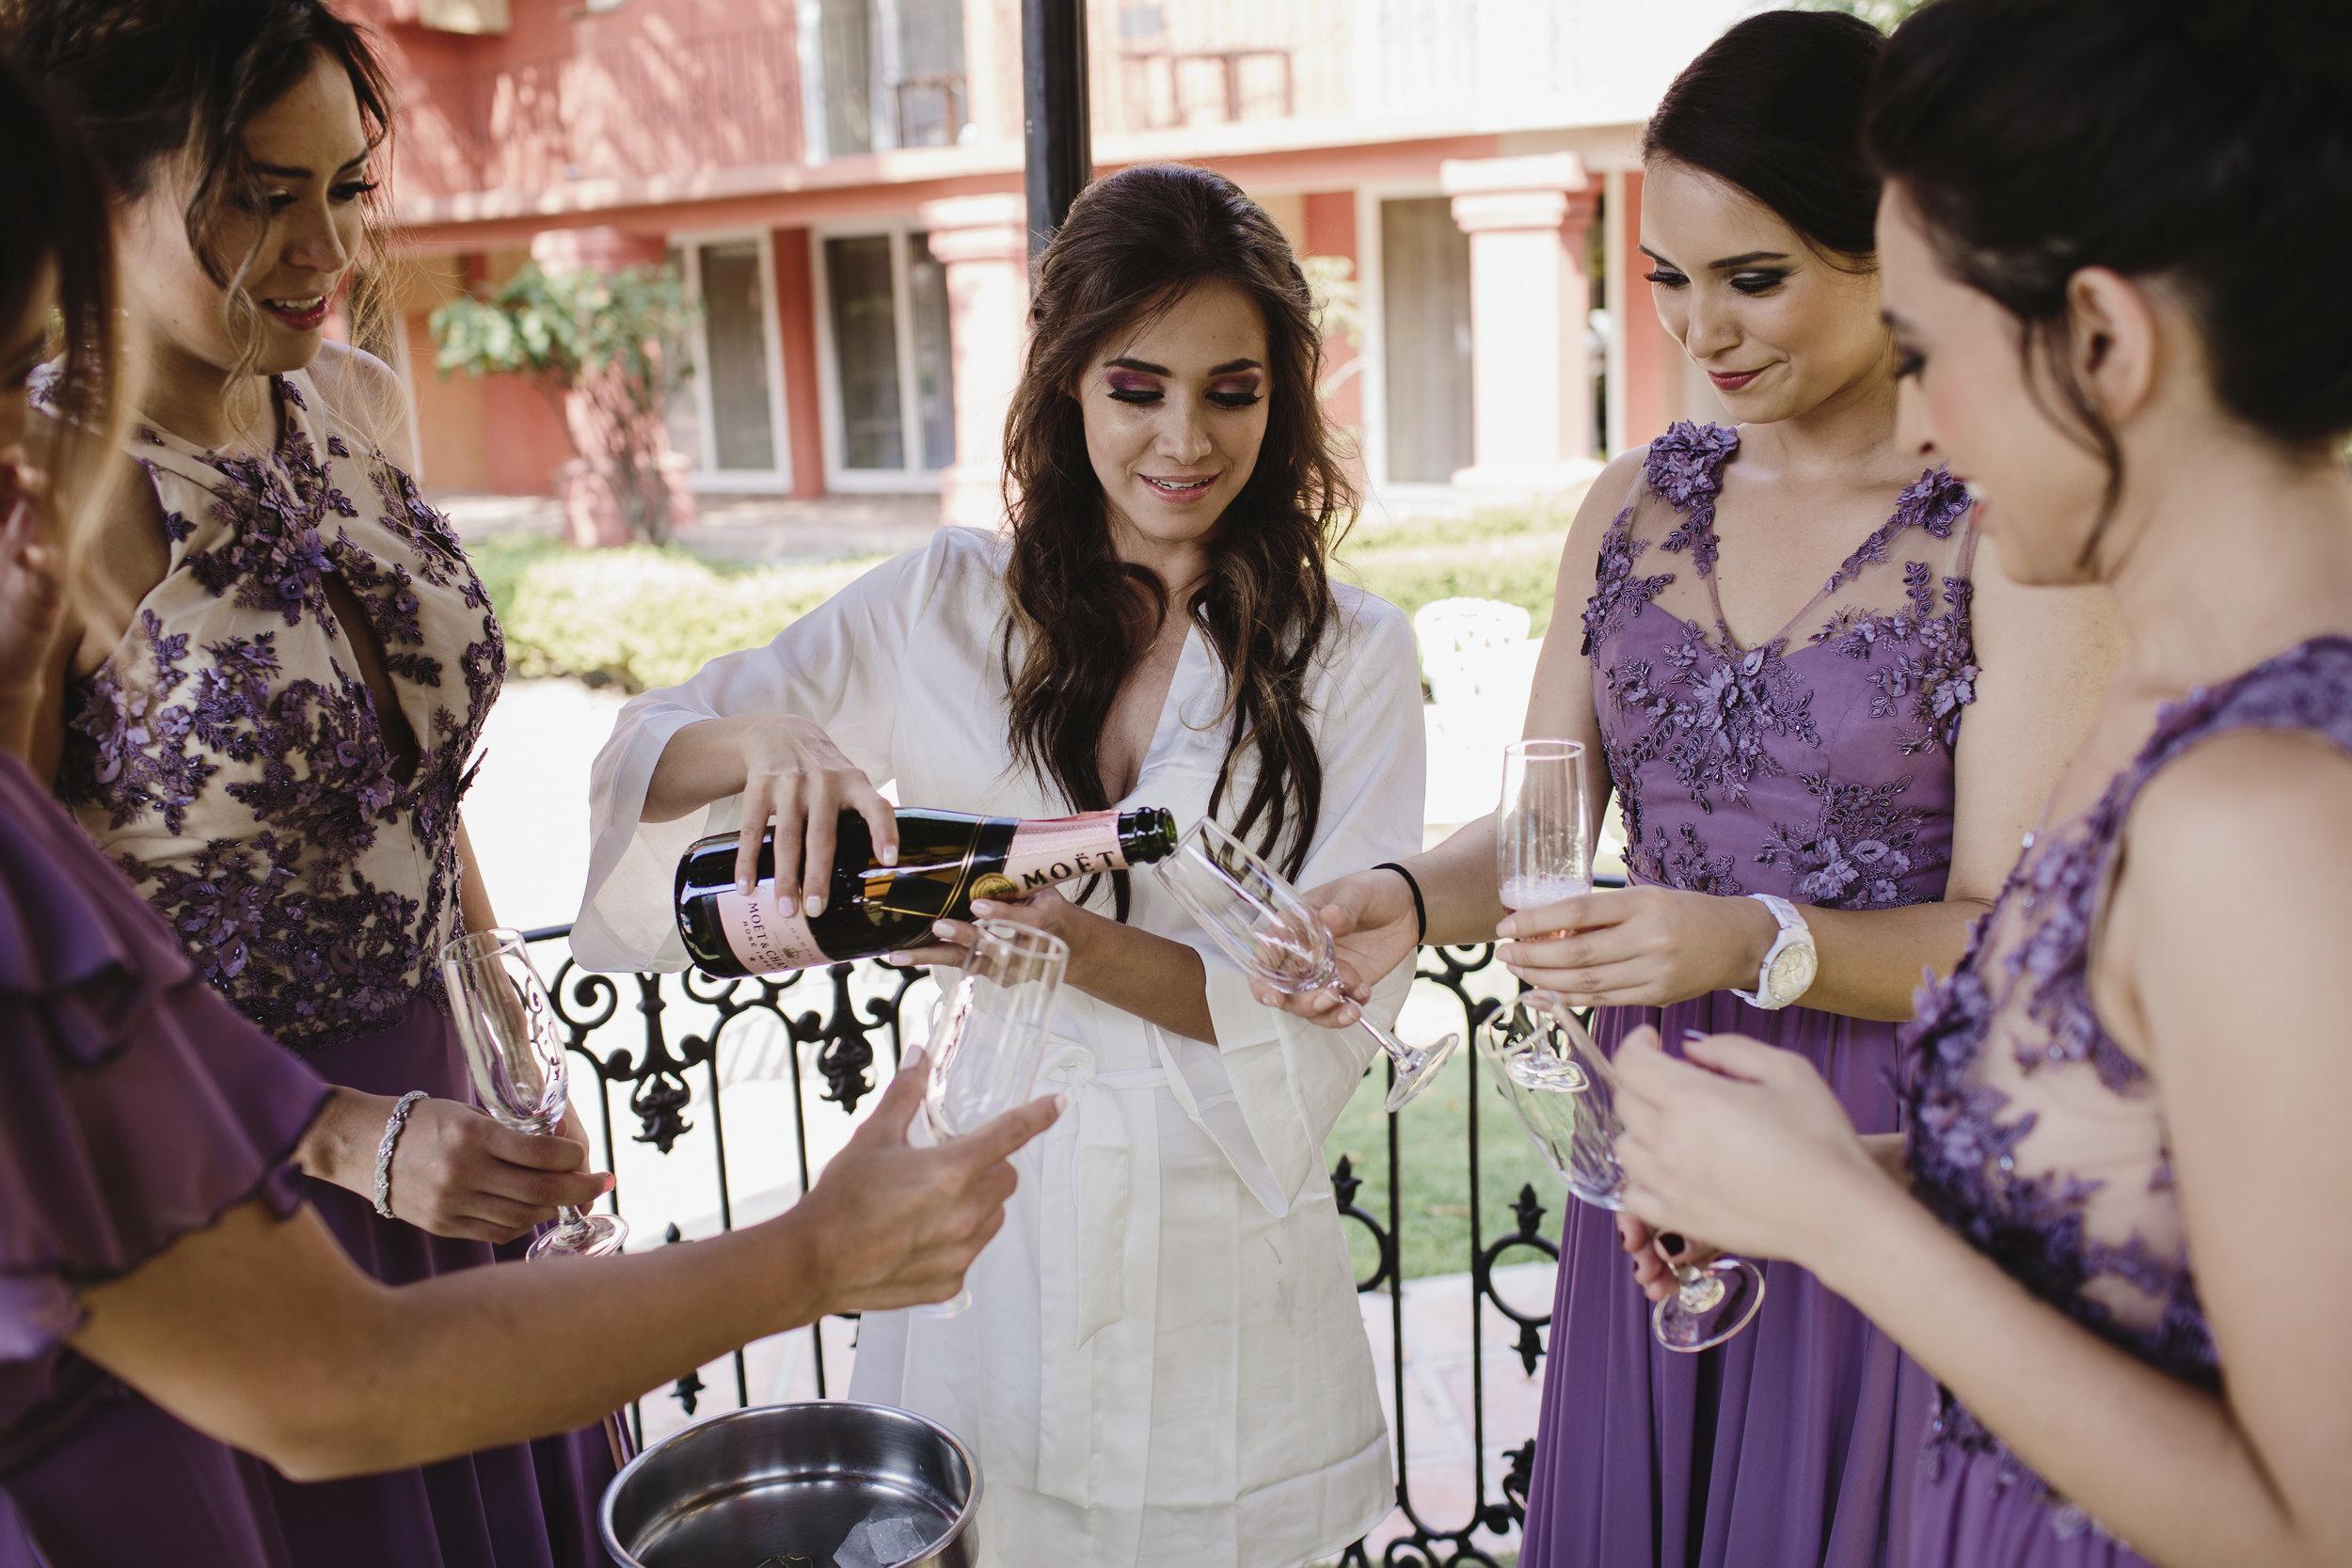 alfons_flores_destination_wedding_photography_mavi_david-580.JPG